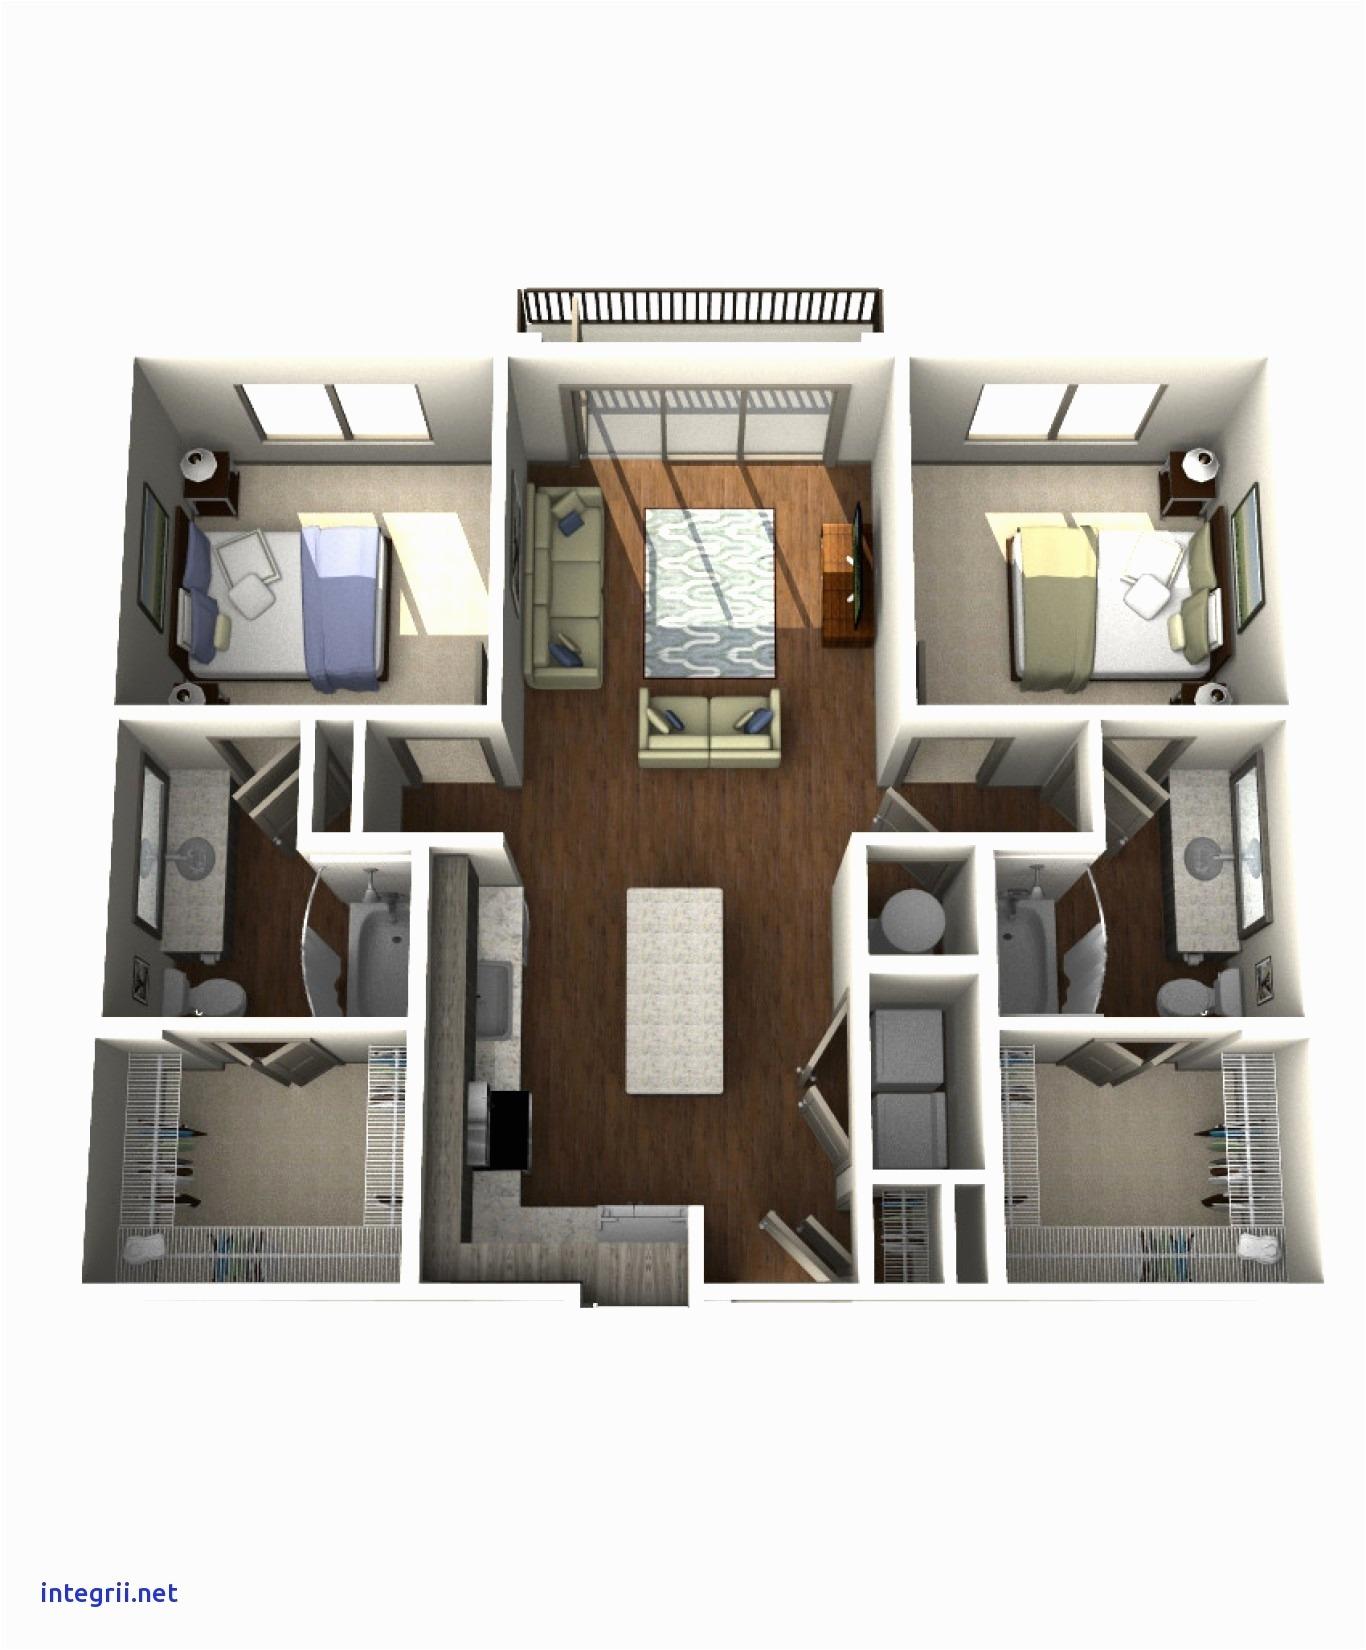 3 bedroom apartments in orlando style 4 bedroom apartments unique bedroom fresh 4 bedroom apartments in